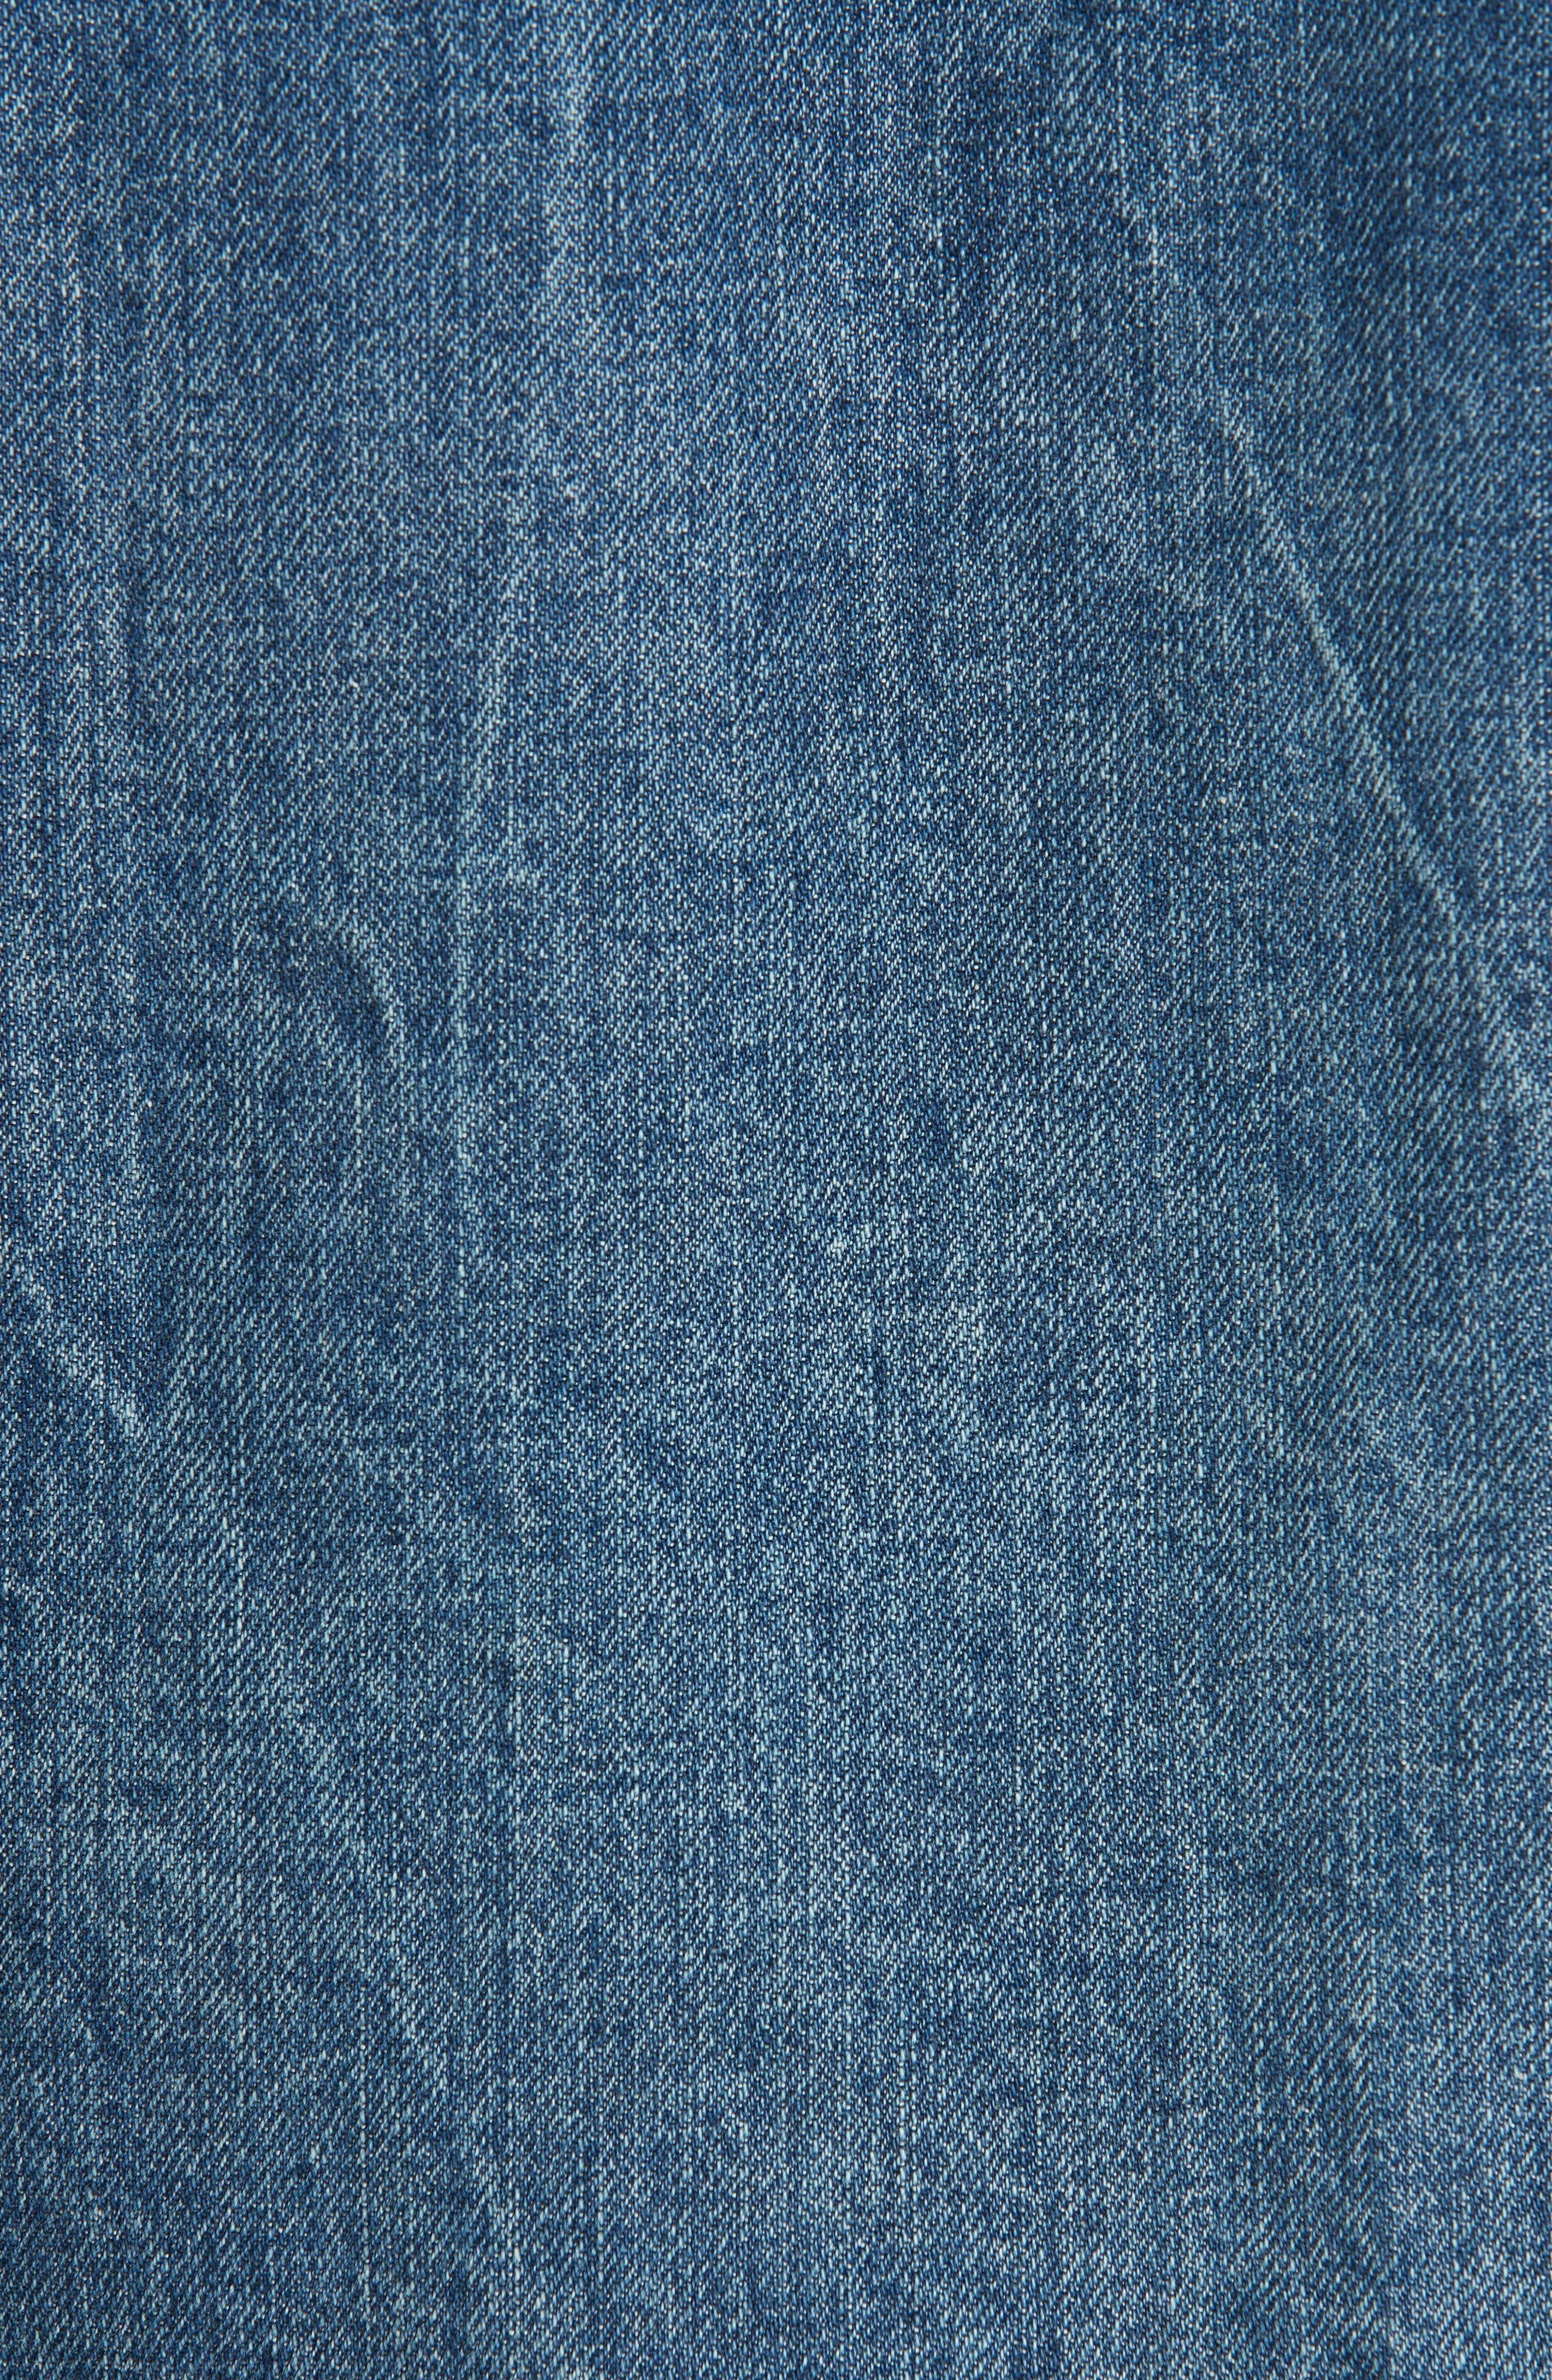 Zip Nico Denim & Leather Jacket,                             Alternate thumbnail 6, color,                             INDIGO